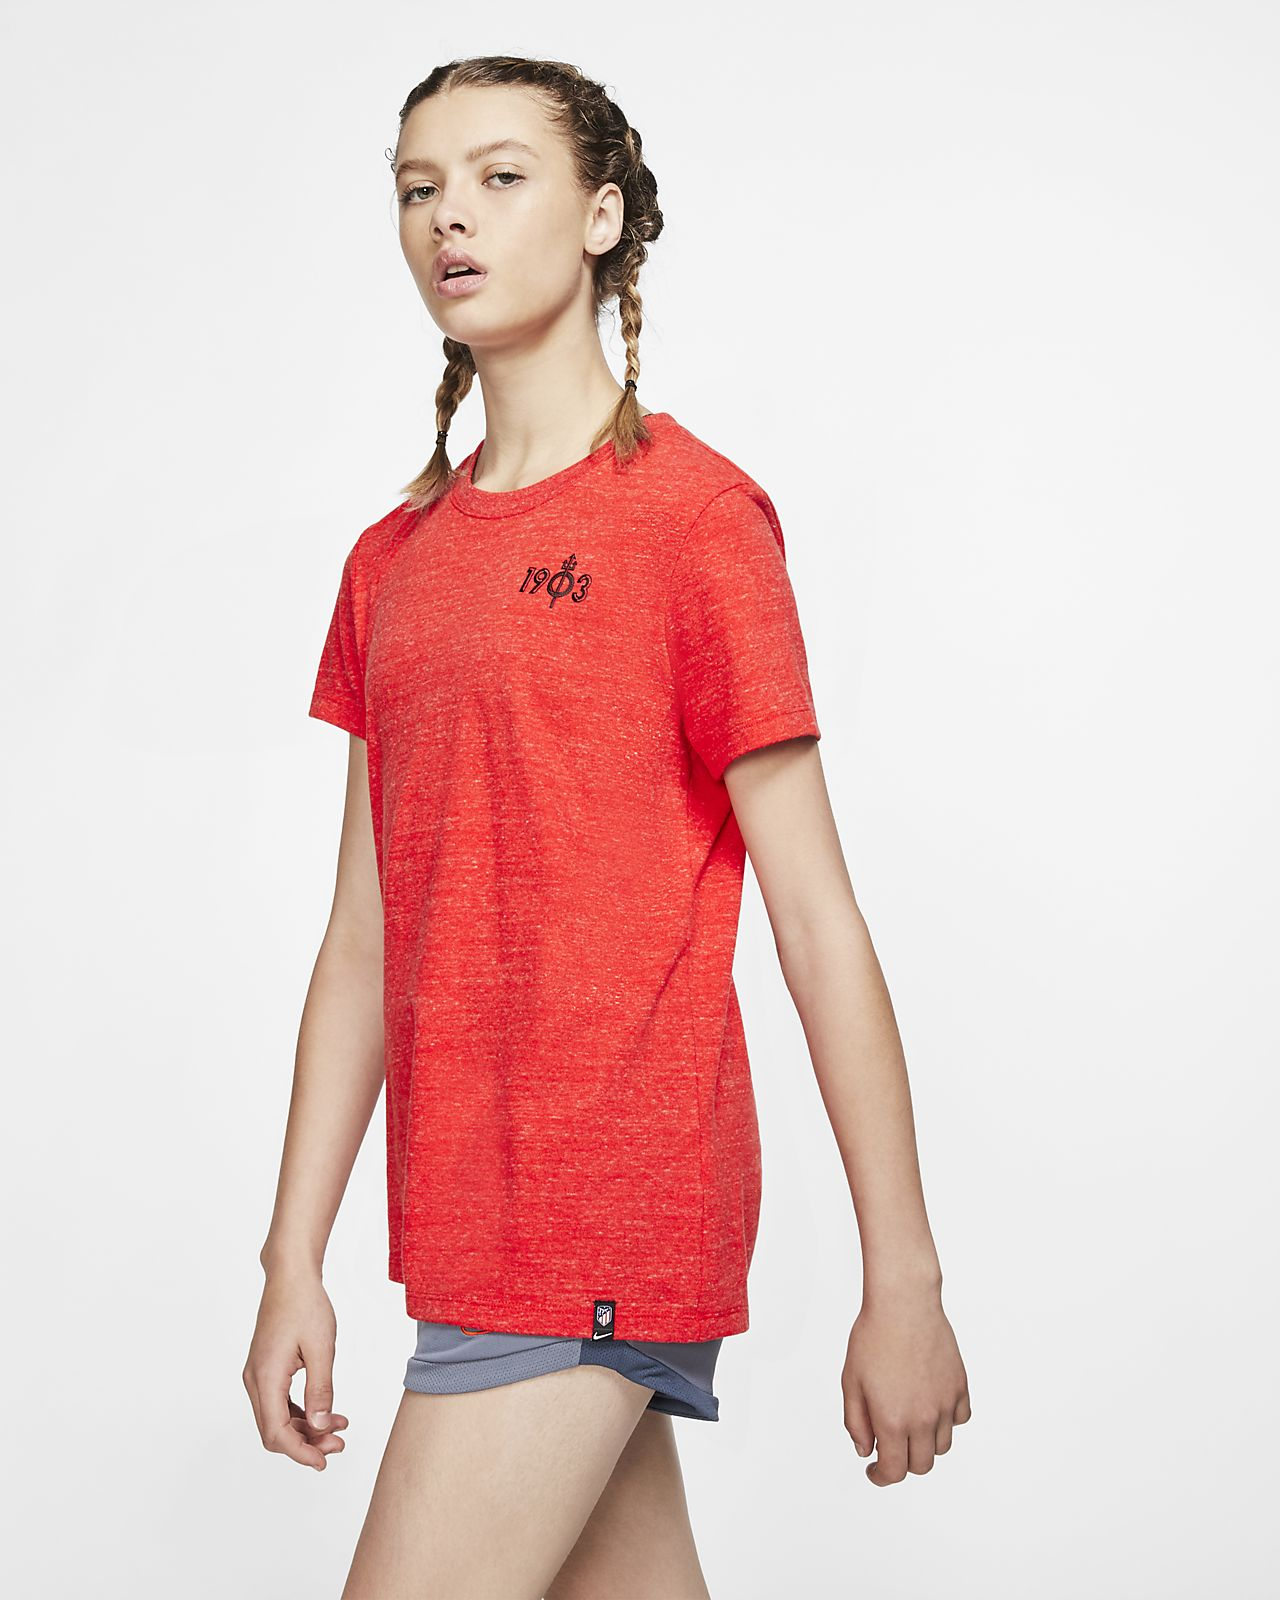 Atlético de Madrid Kadın Tişörtü